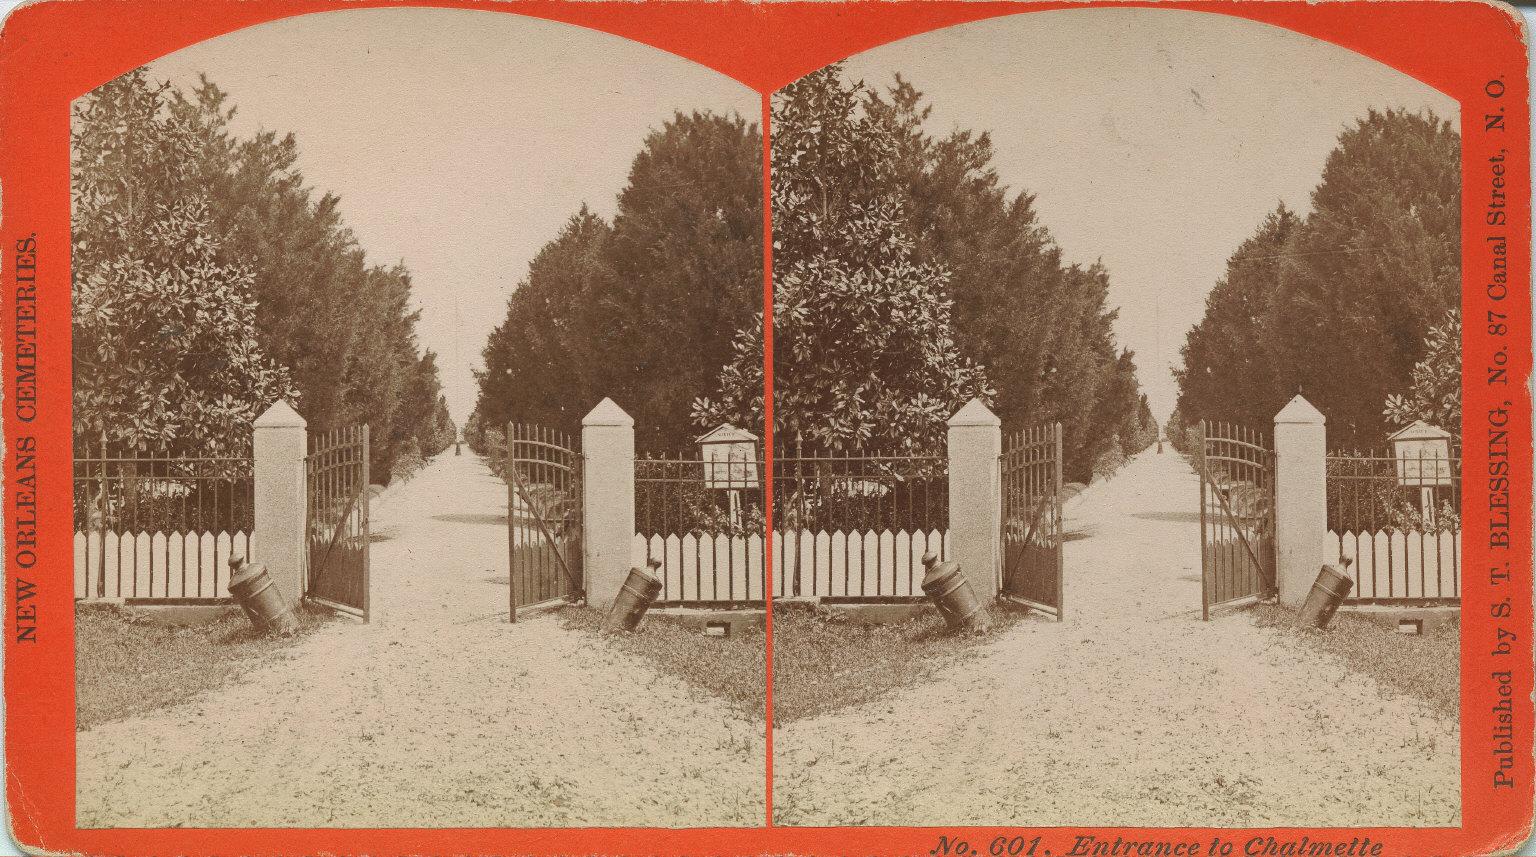 Entrance to Chalmette Cemetery